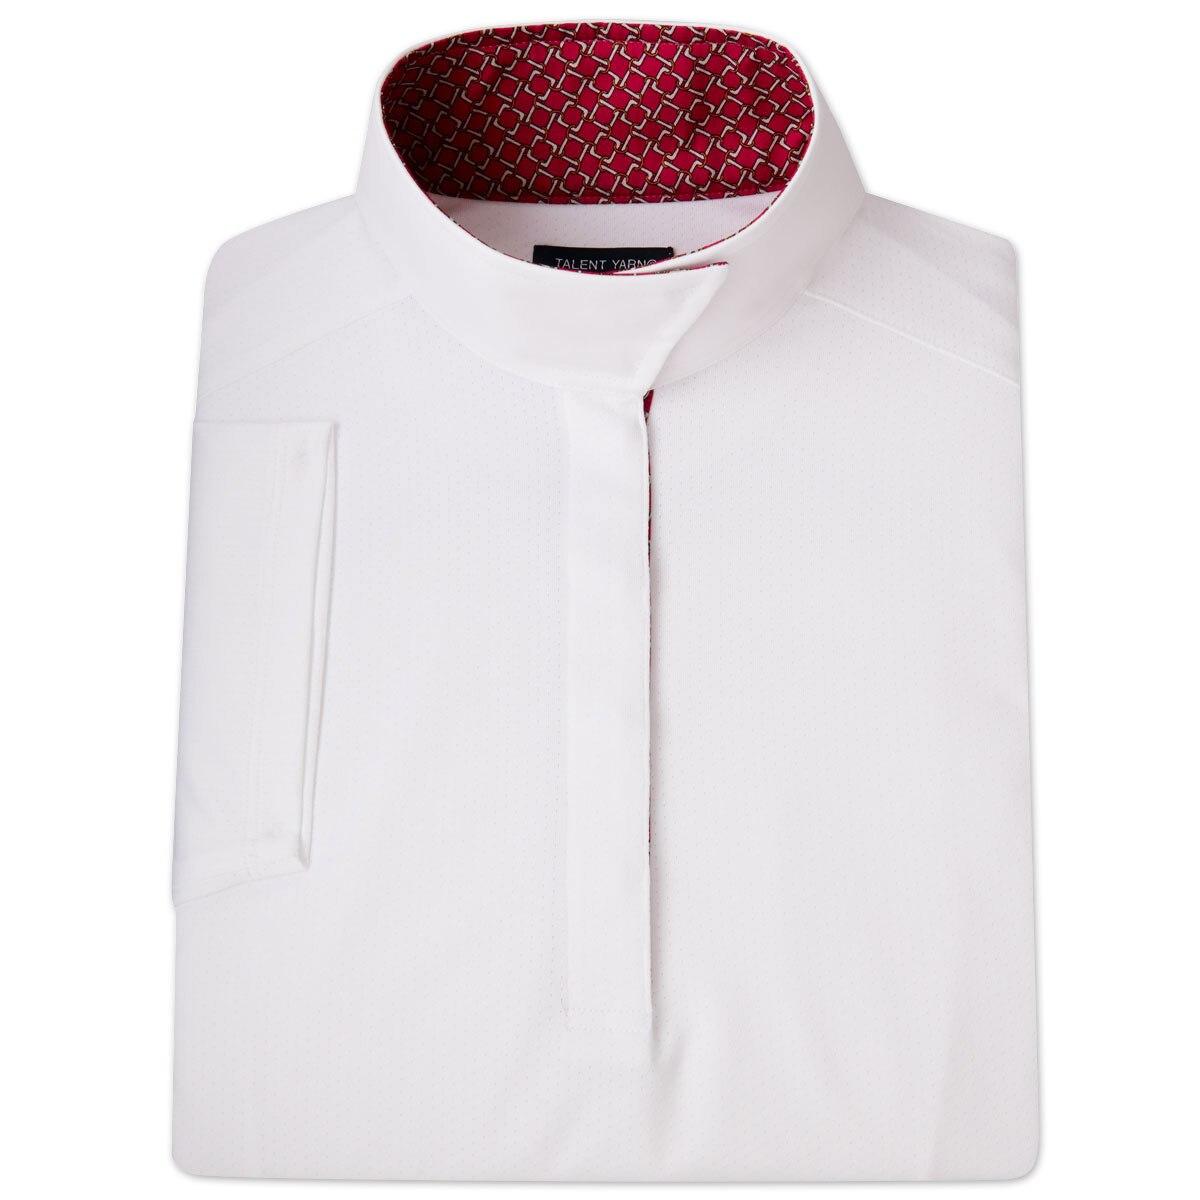 Essex Classics Talent Yarn Shirt - Shortsleeve - Sale!